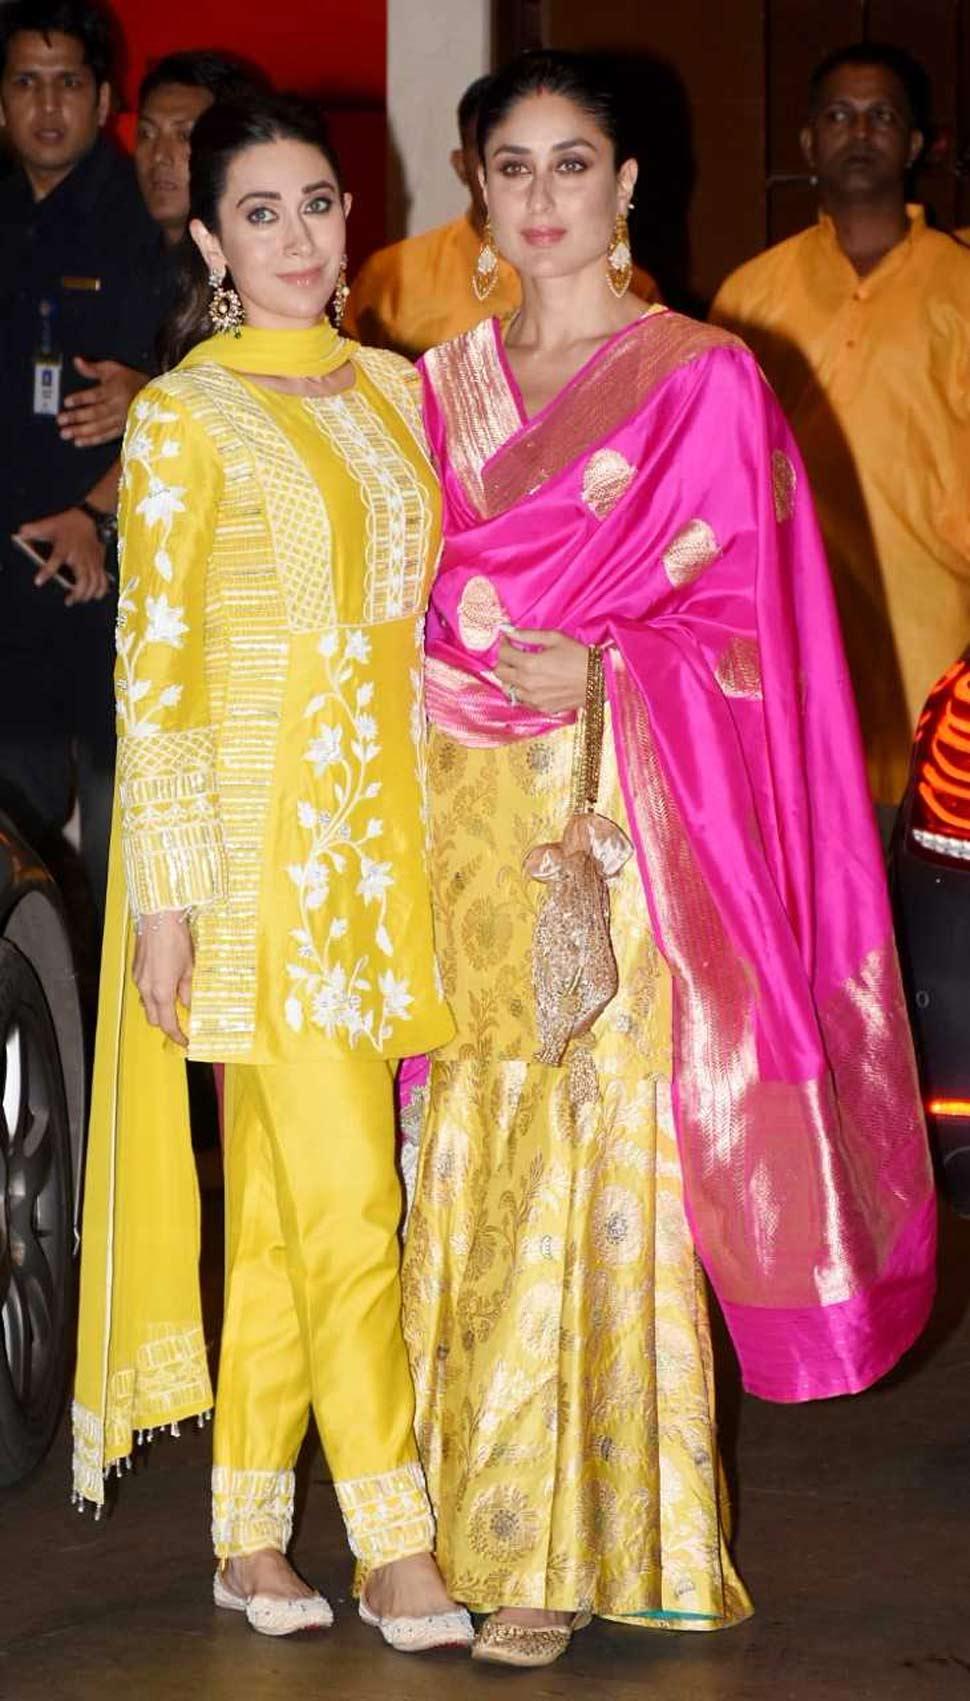 Kapoor Sister Karshima with Kareena